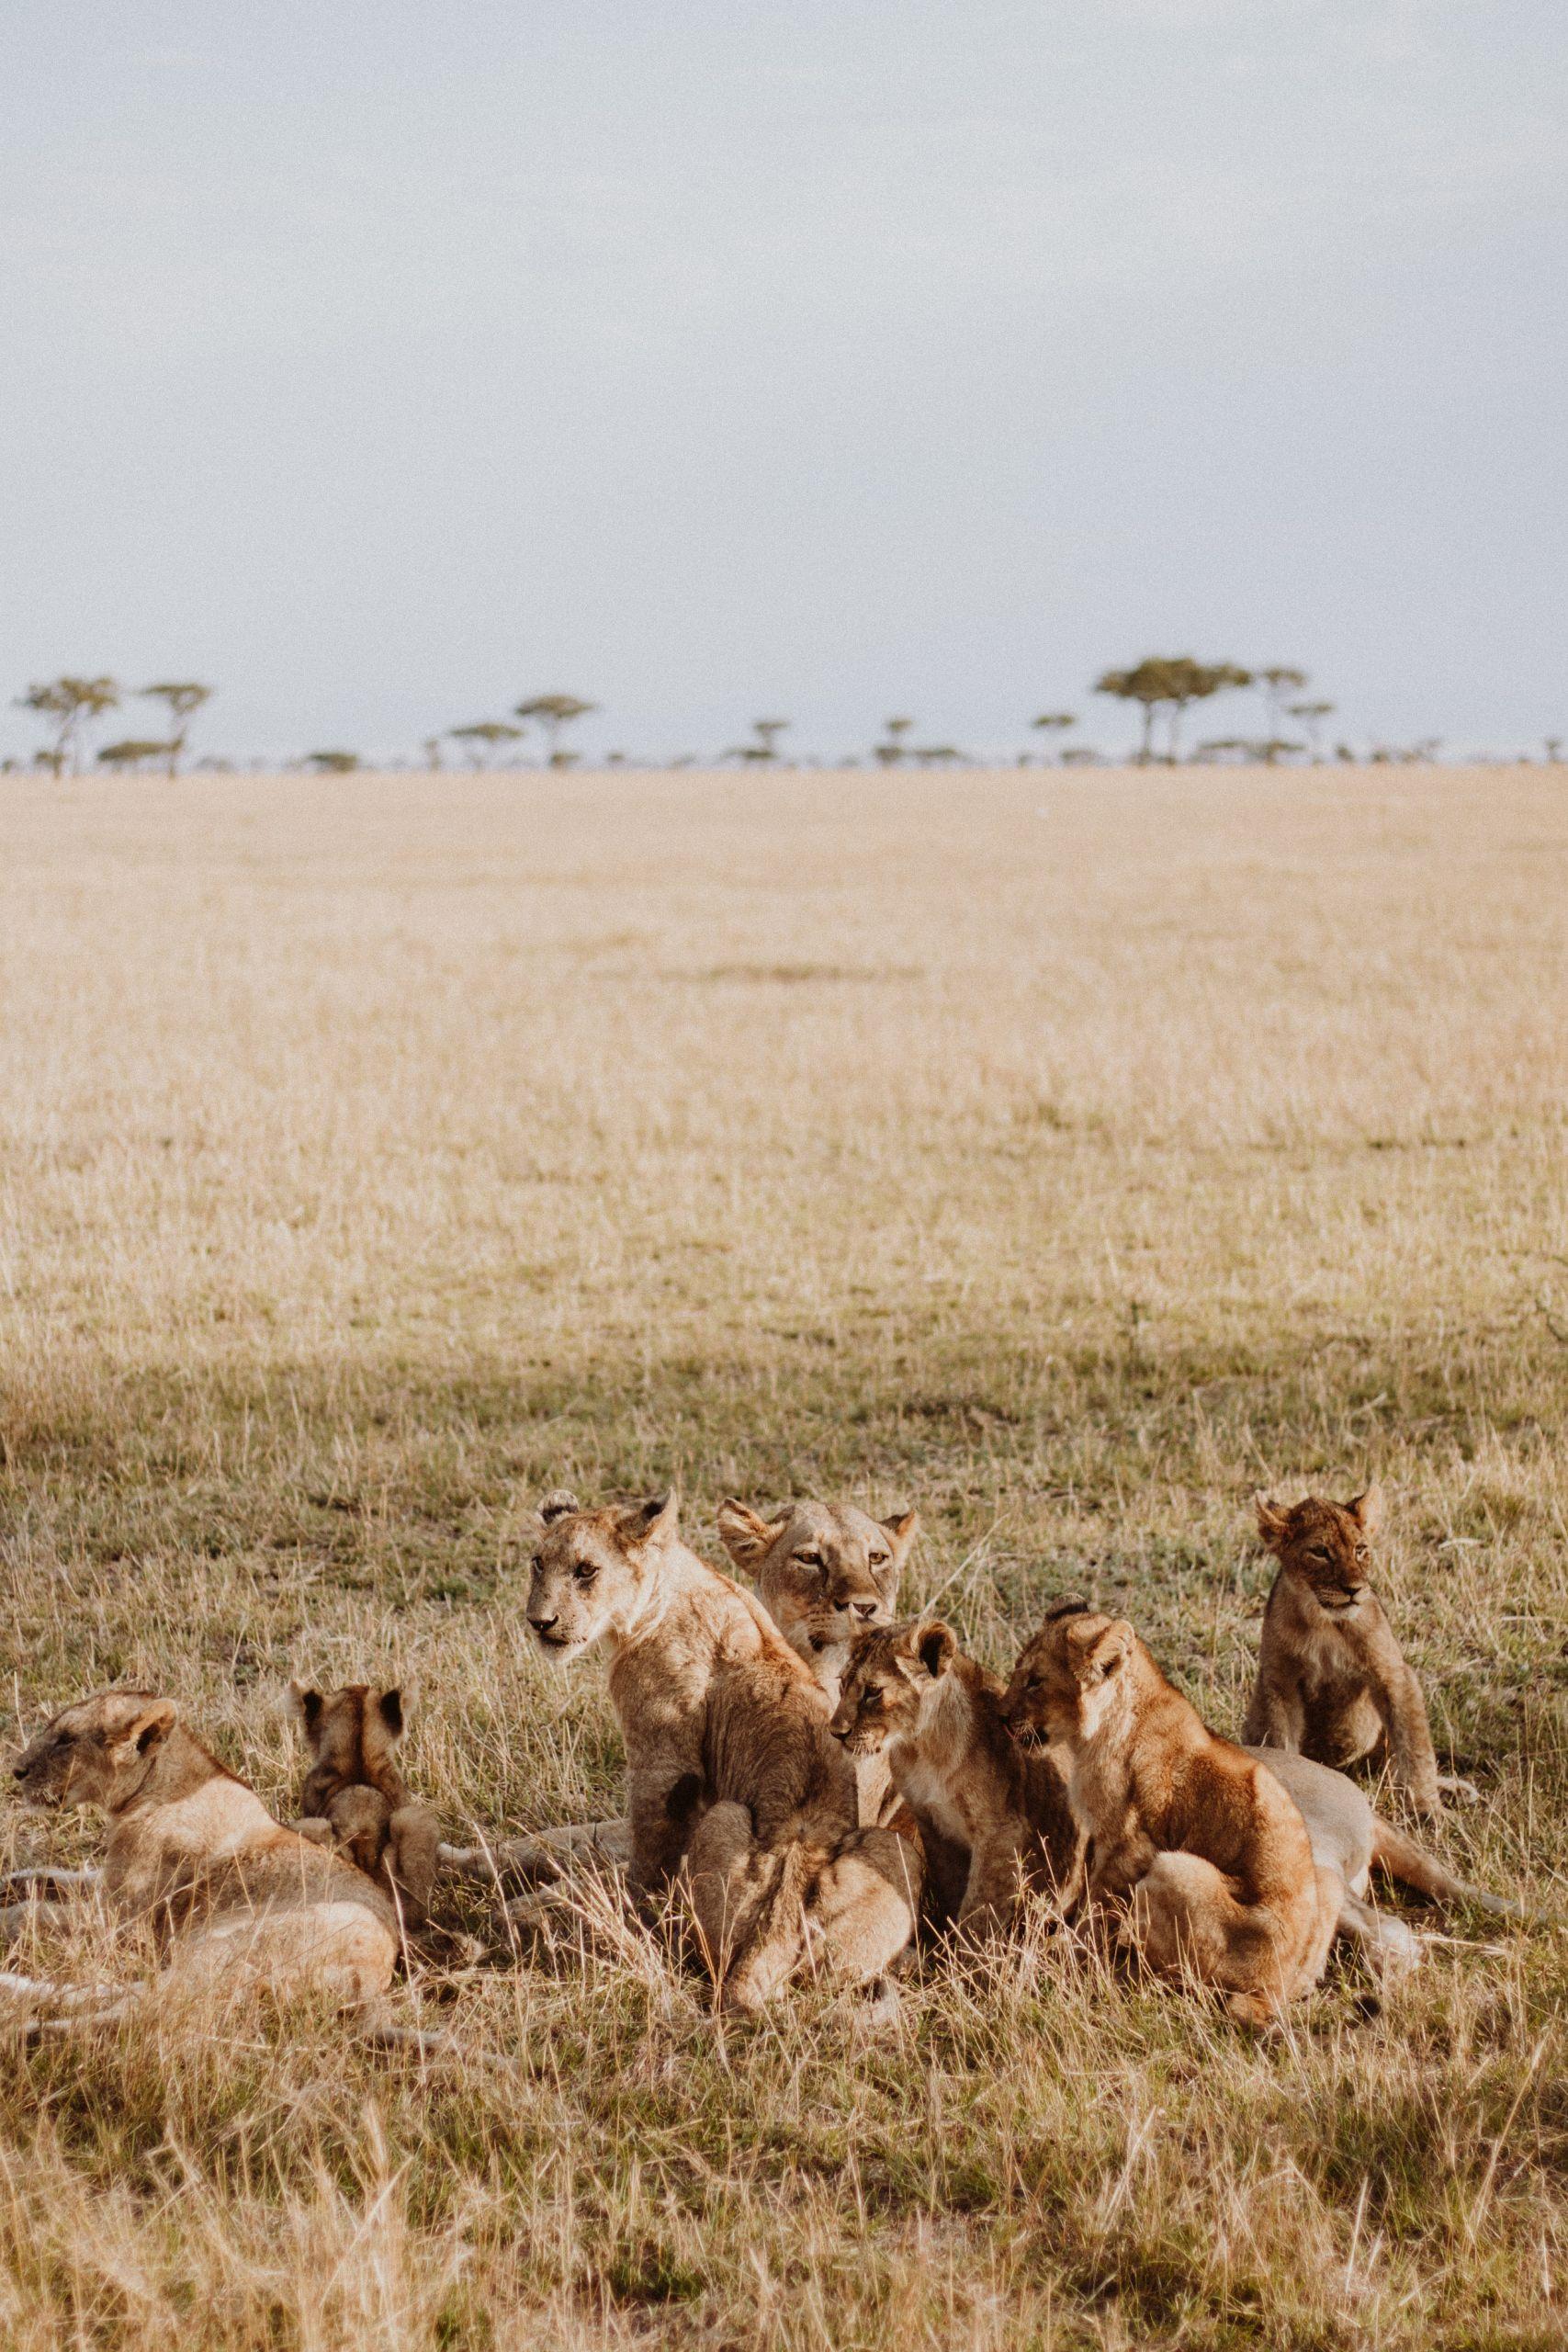 Travel Inspiration Safari | The Daily Dose